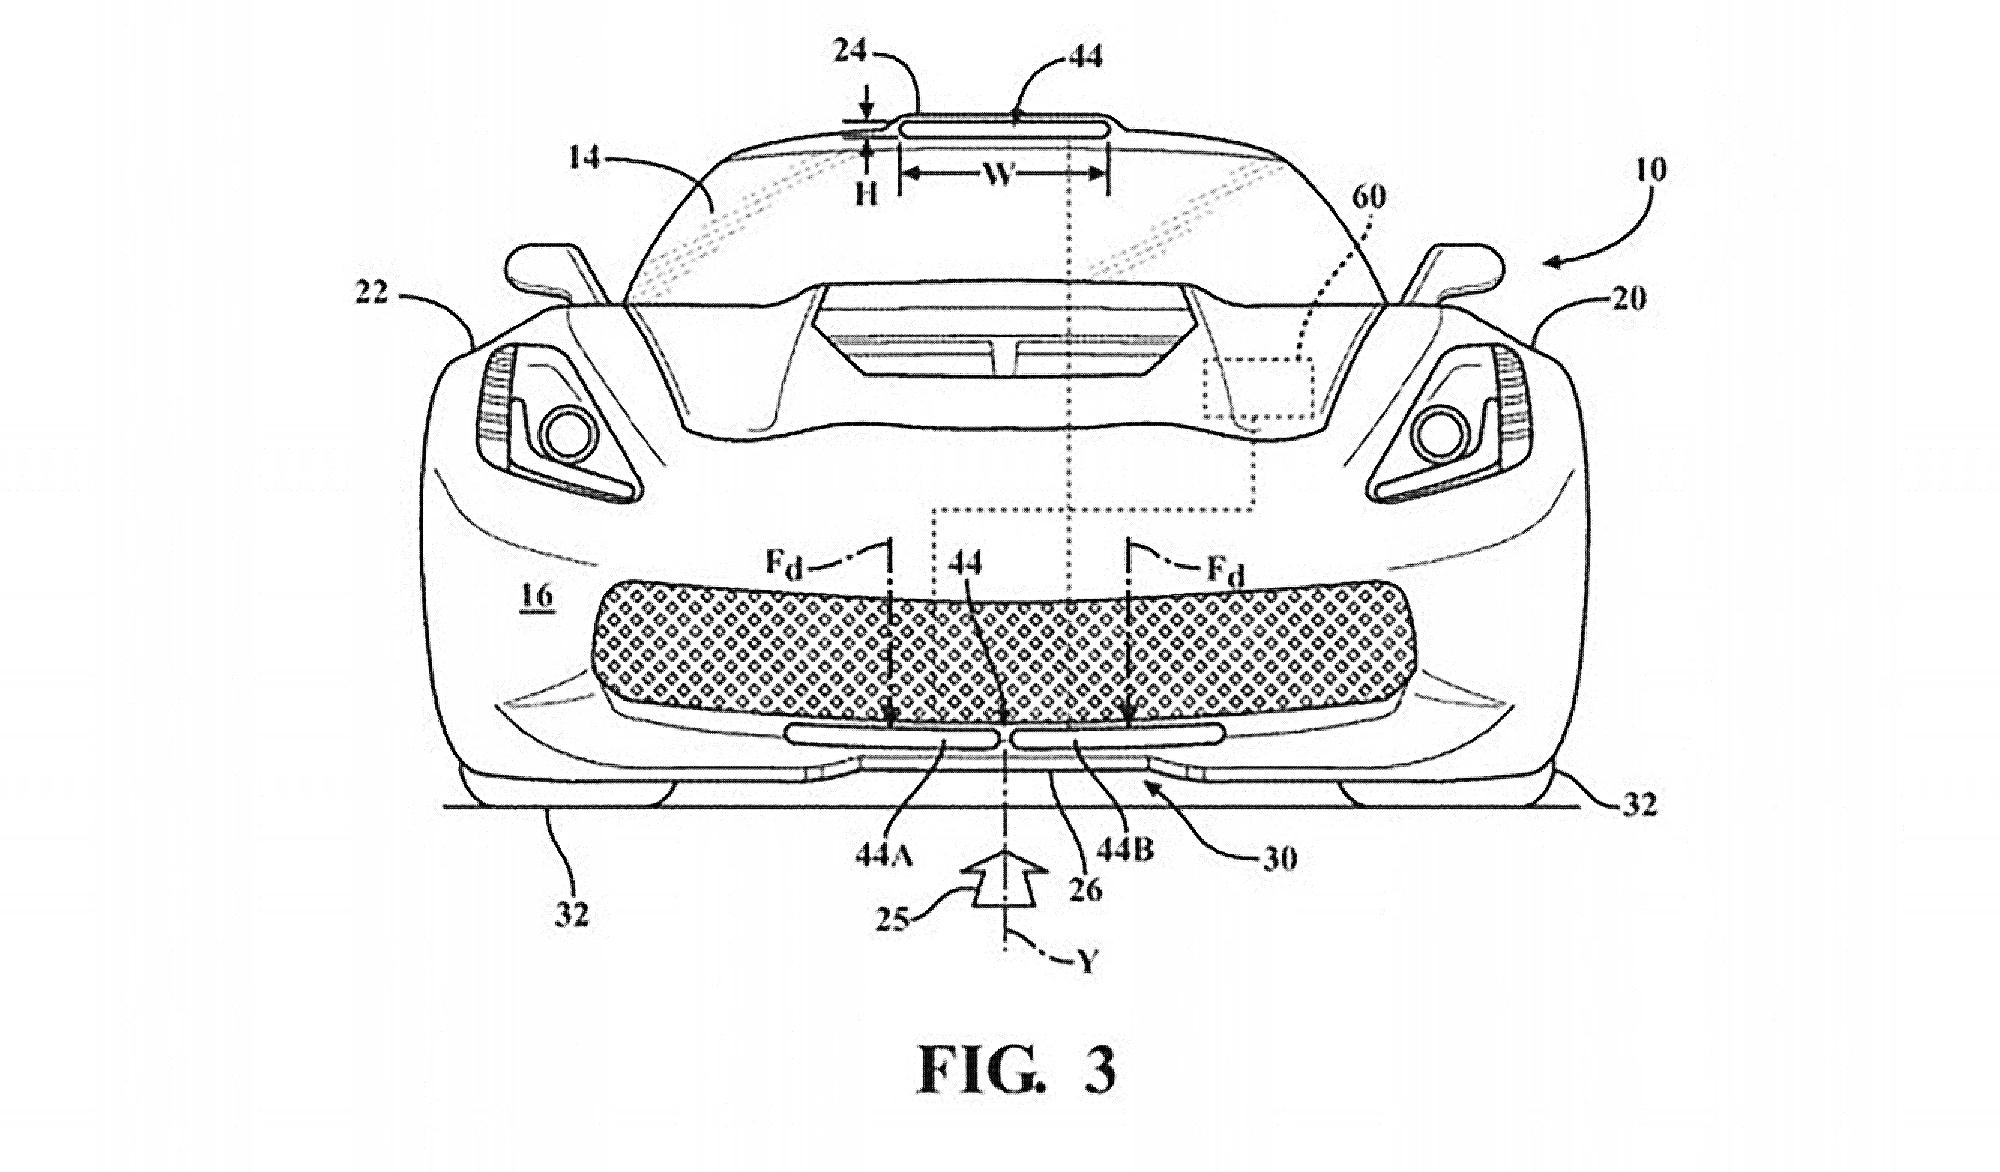 Gm Files Interesting New Aerodynamic Patents